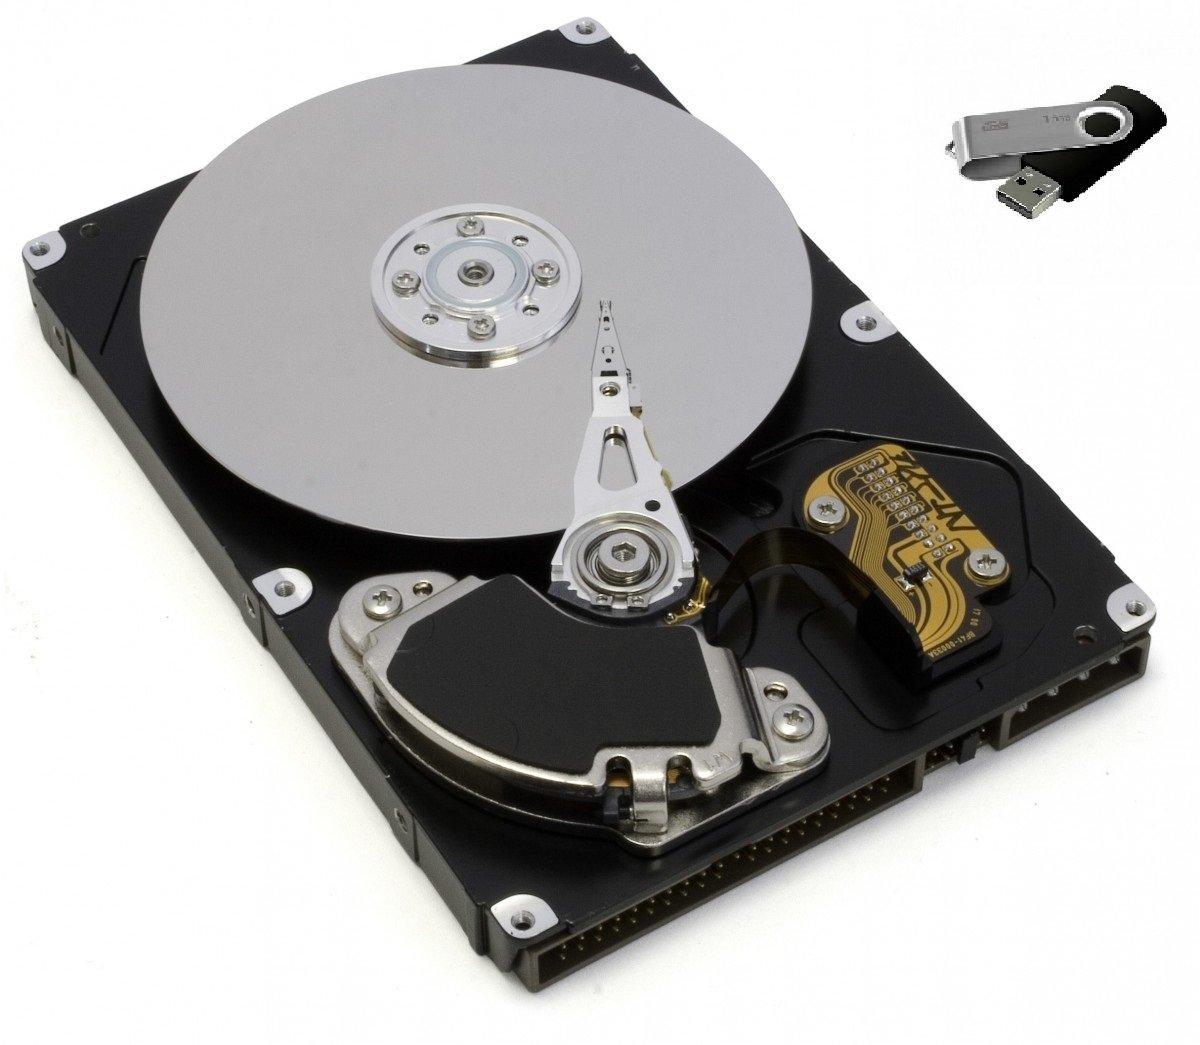 Cómo reparar un disco duro o pendrive dañado.